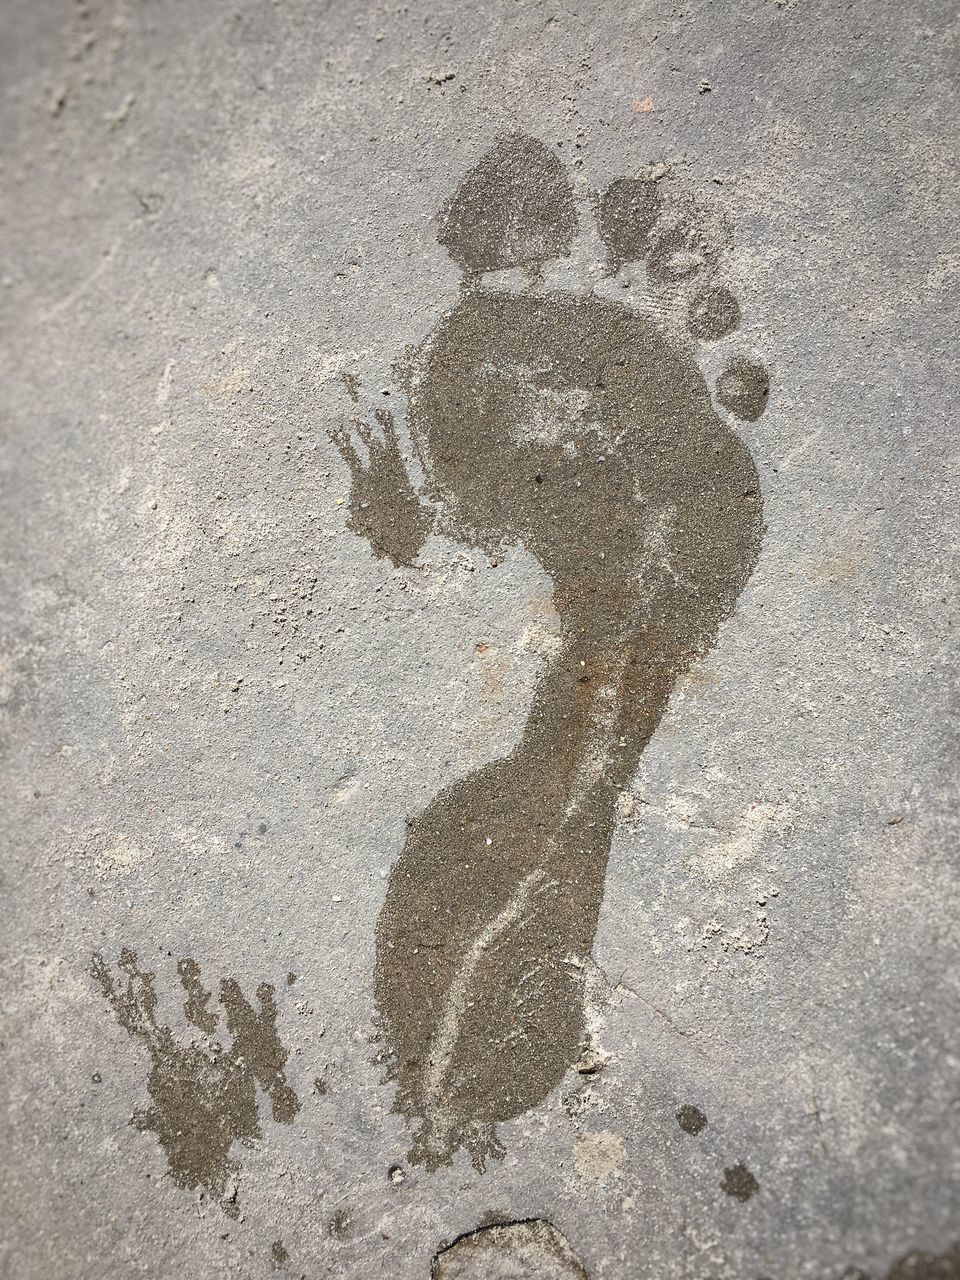 creativity, day, outdoors, human representation, sand, beach, no people, nature, close-up